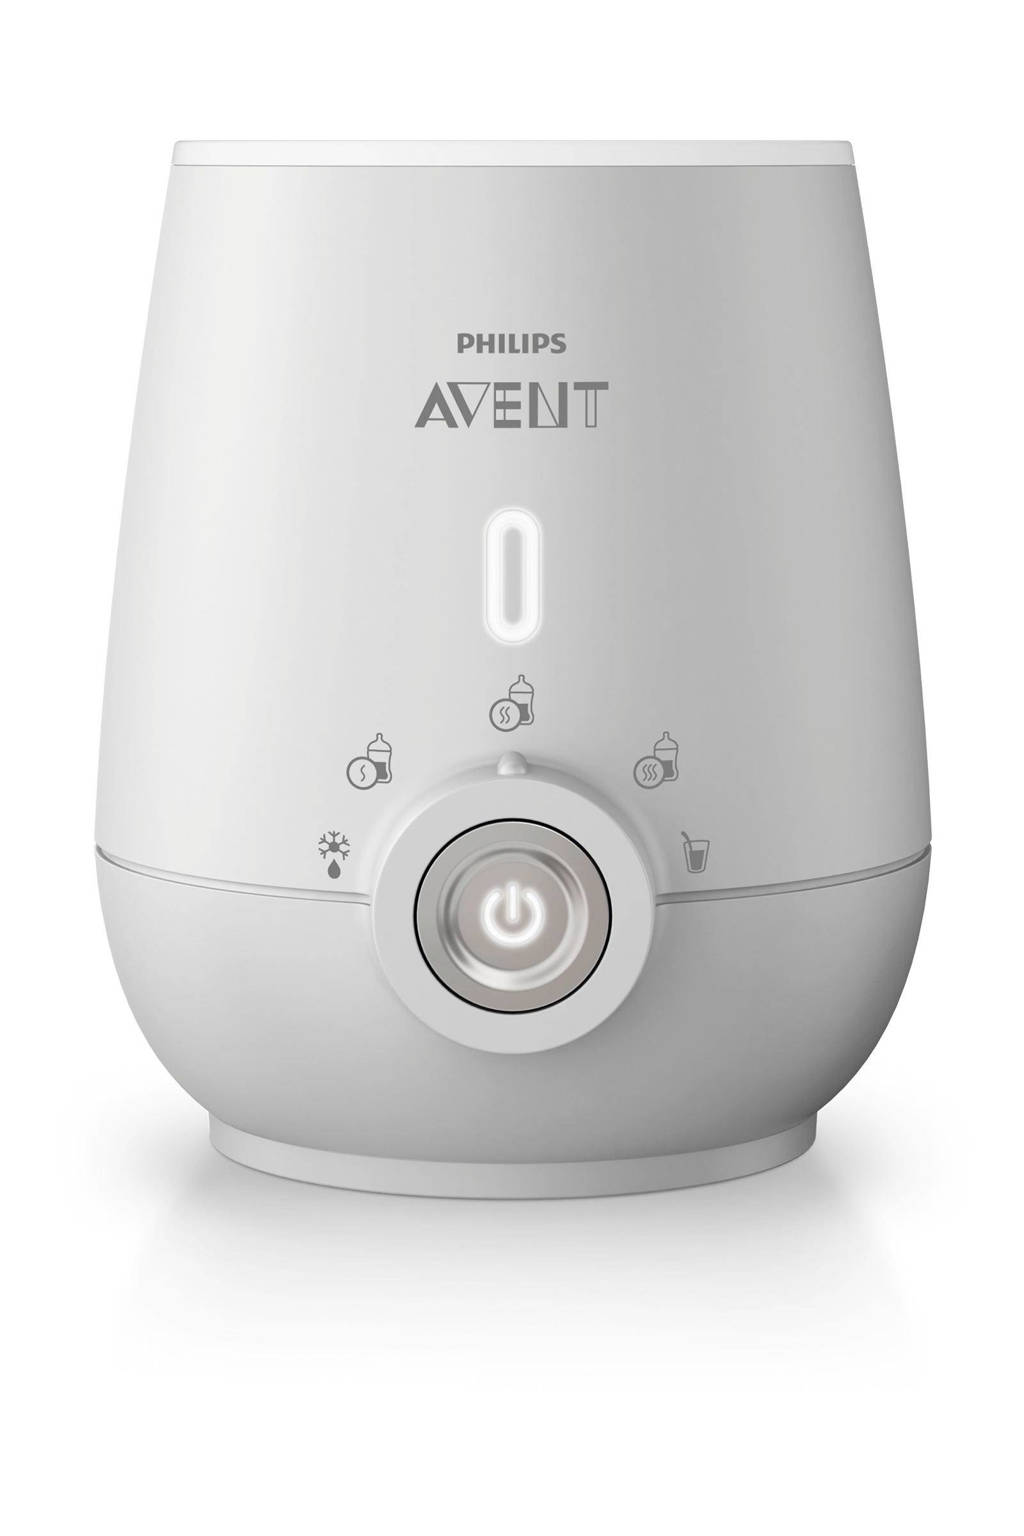 Philips AVENT SCF356/00 flessenwarmer